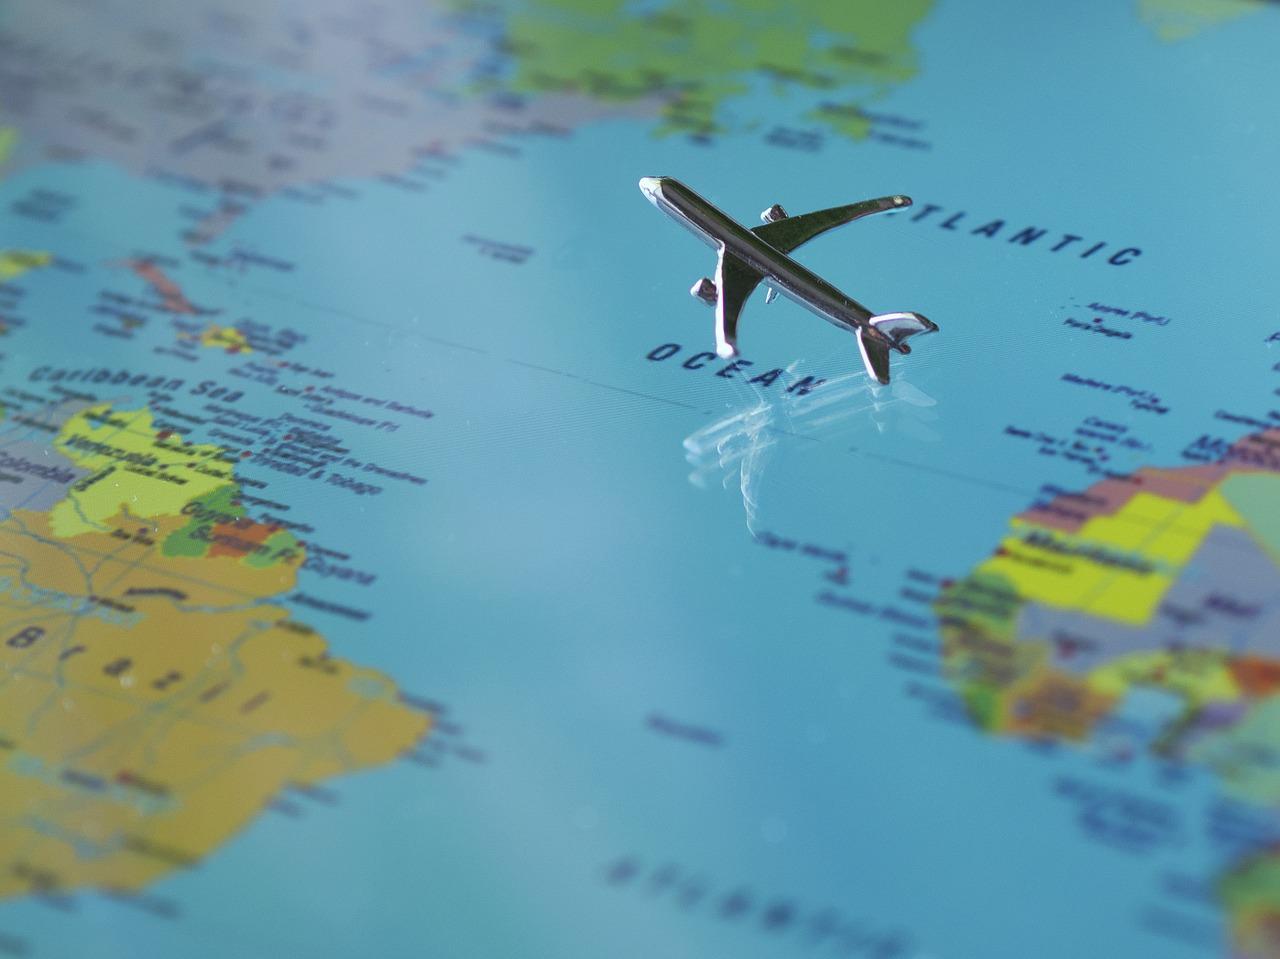 aircraft map.jpg